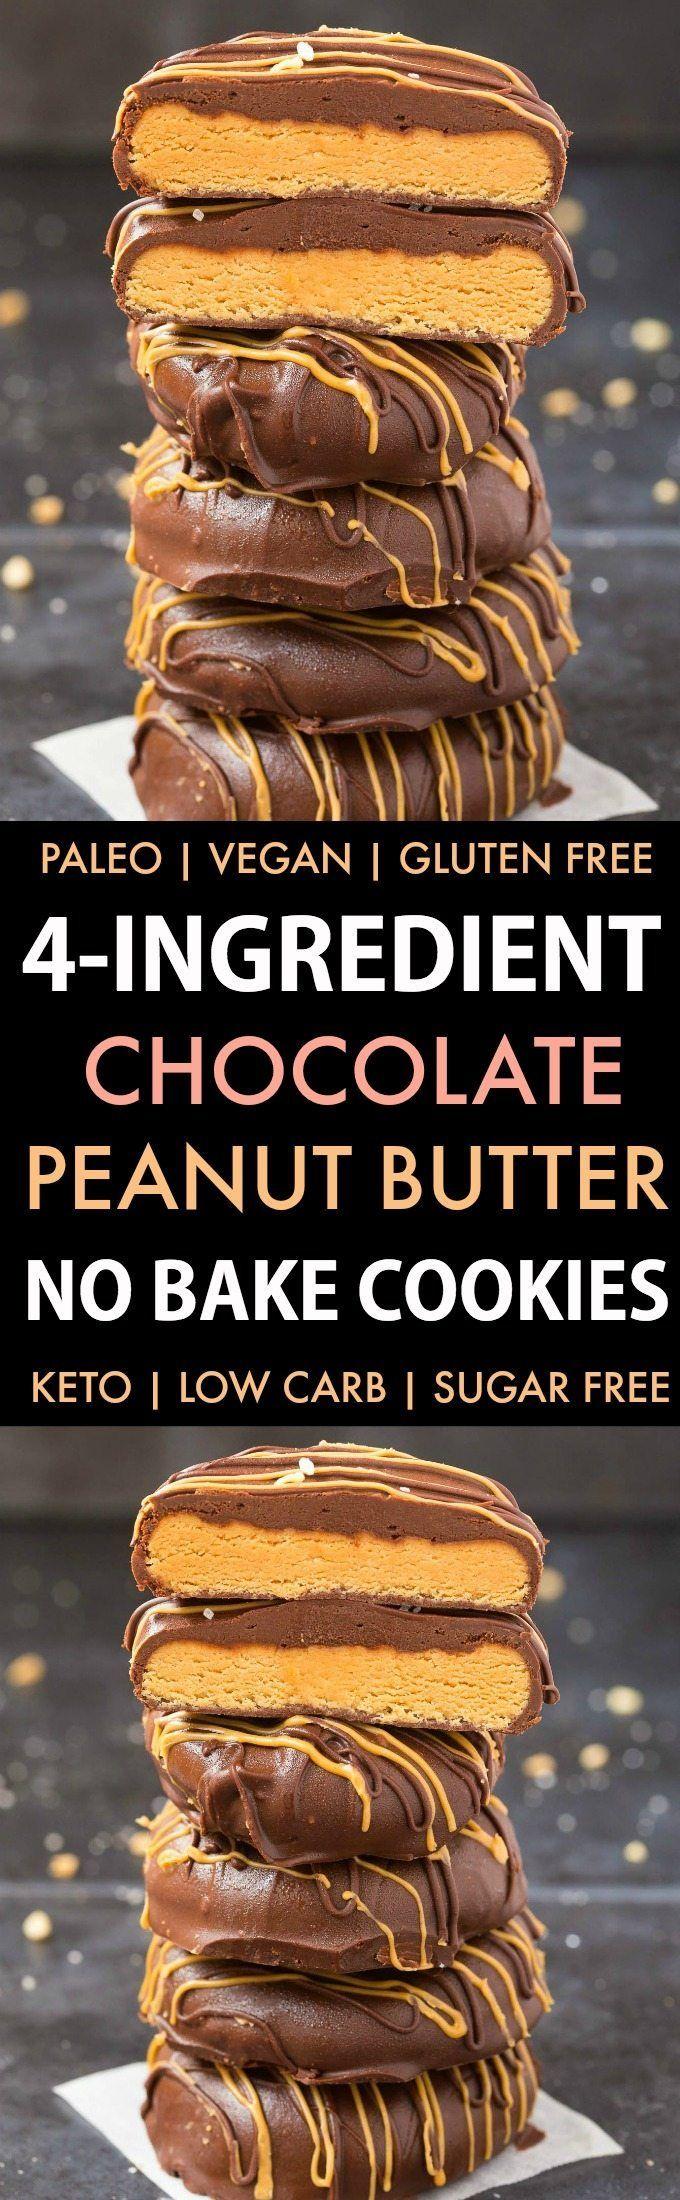 4-Ingredient No Bake Chocolate Peanut Butter Cookies (Paleo, Vegan, Keto, Sugar Free, Gluten Free) Easy, delicious low carb cookies.